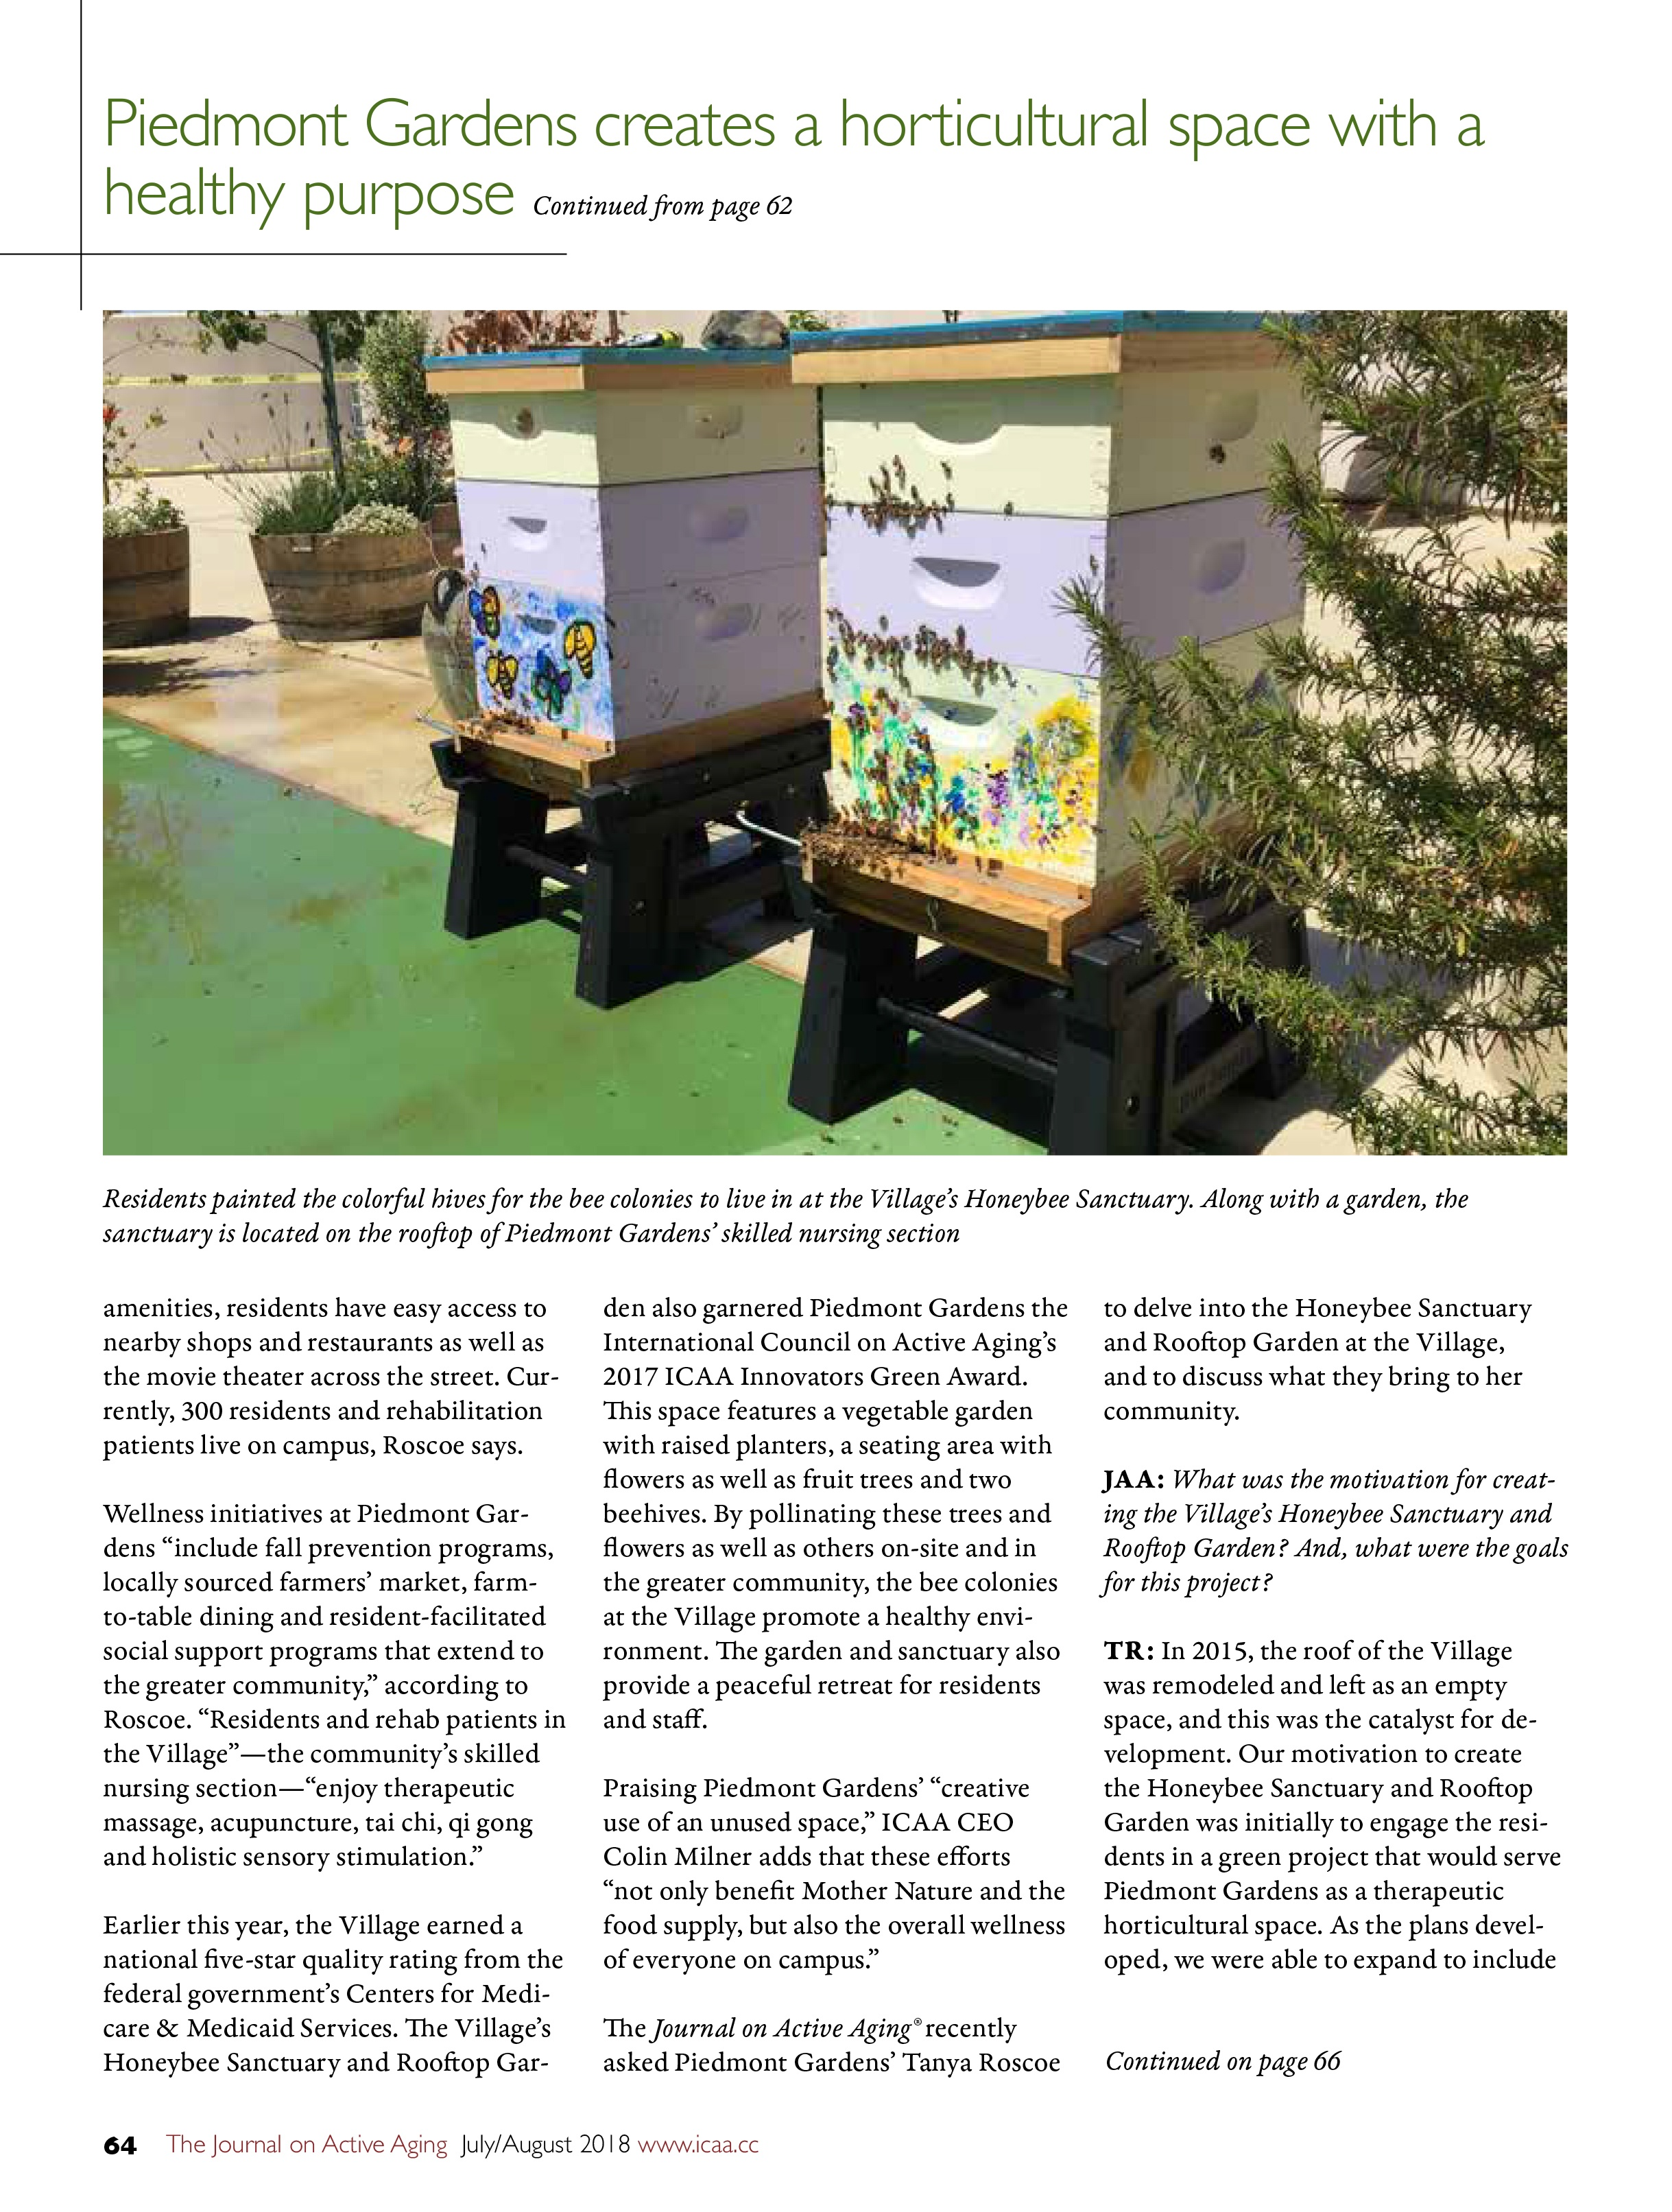 Innovators-Piedmont Gardens-low res-3.jpg